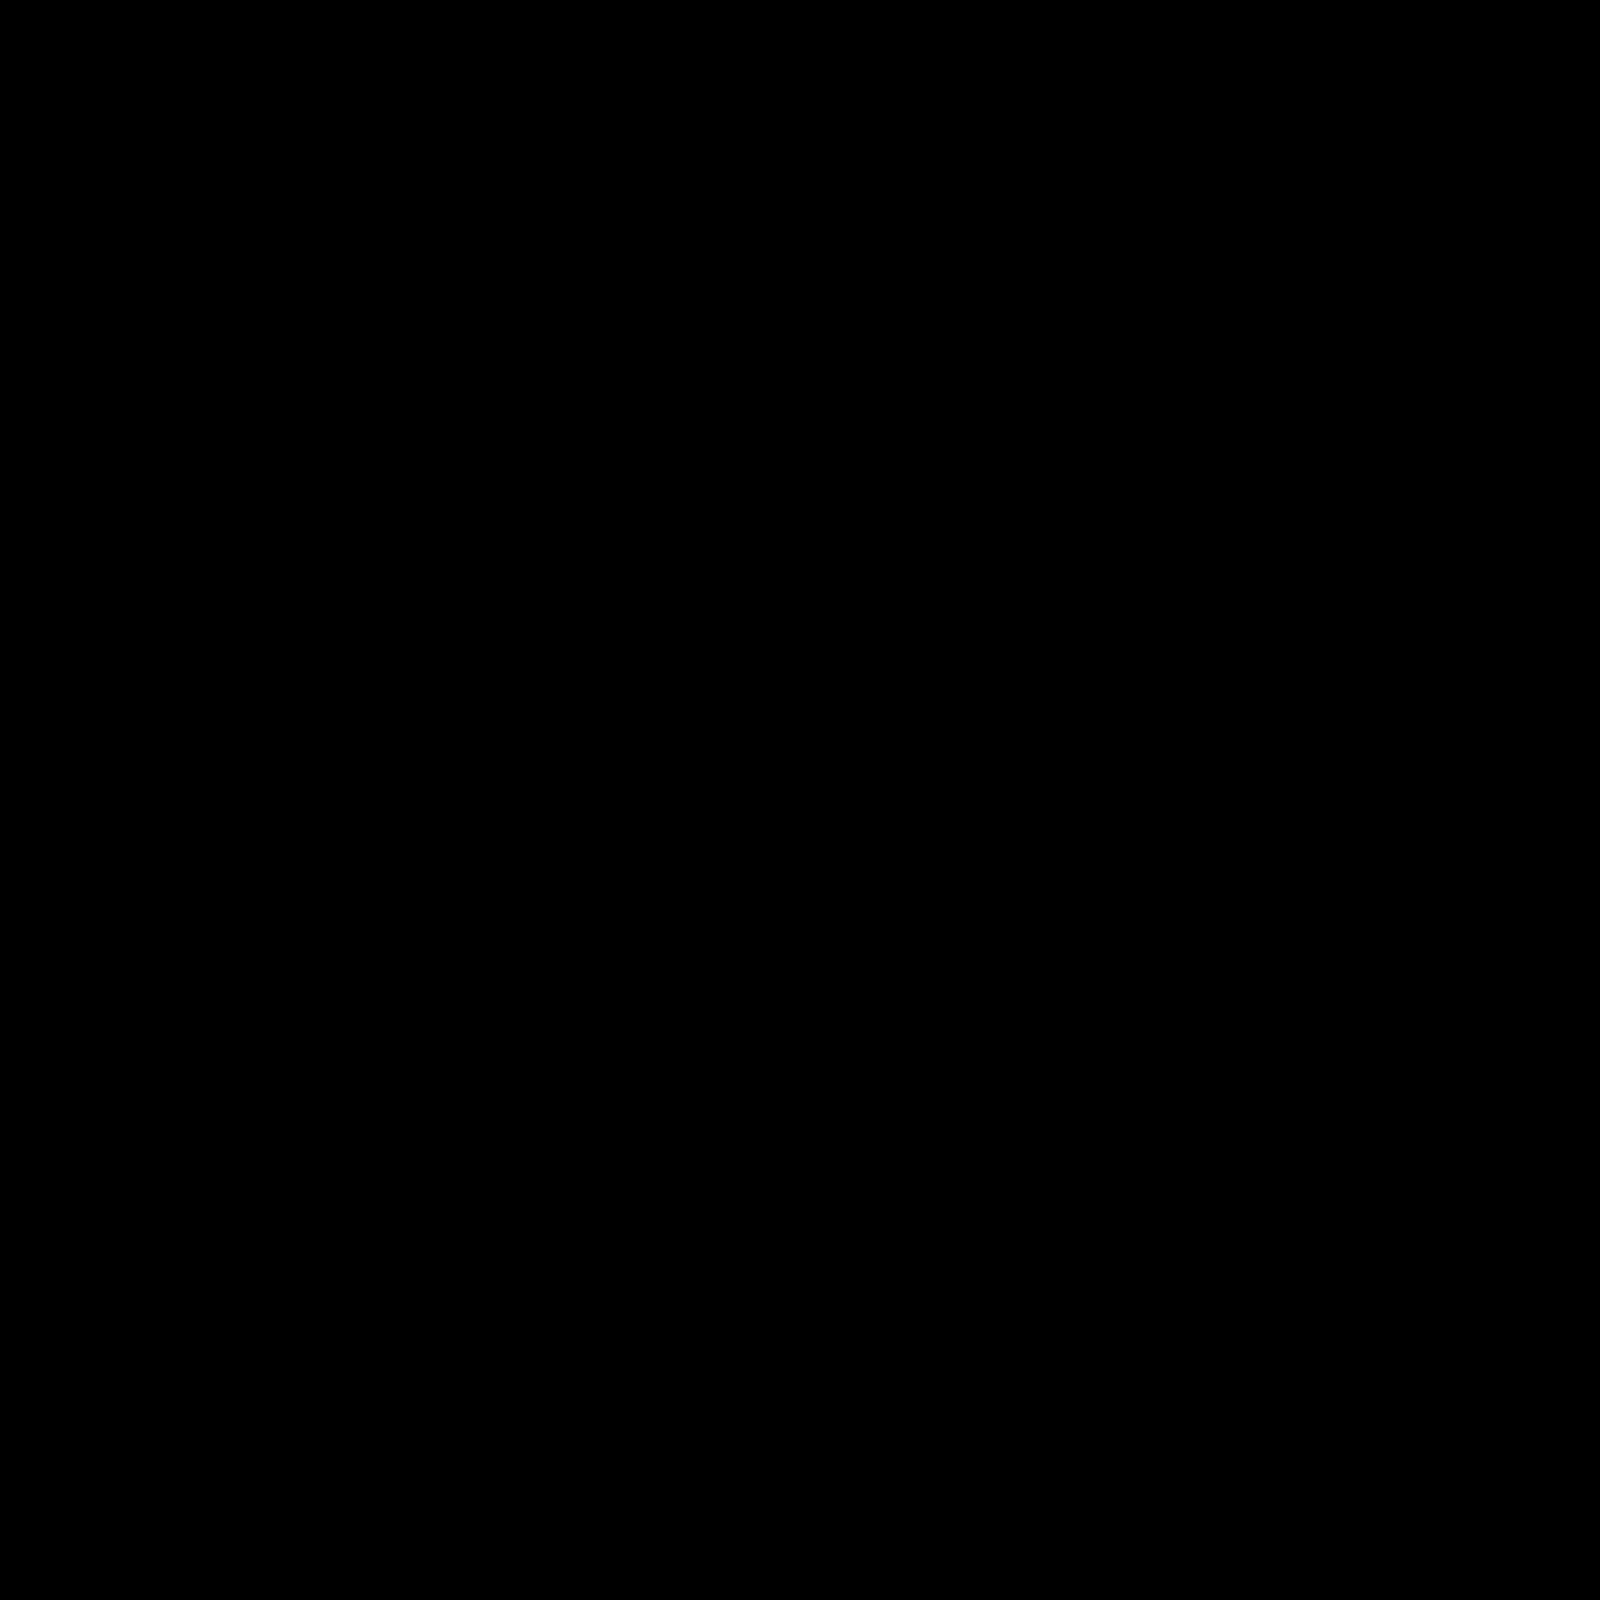 Mac Dock icon